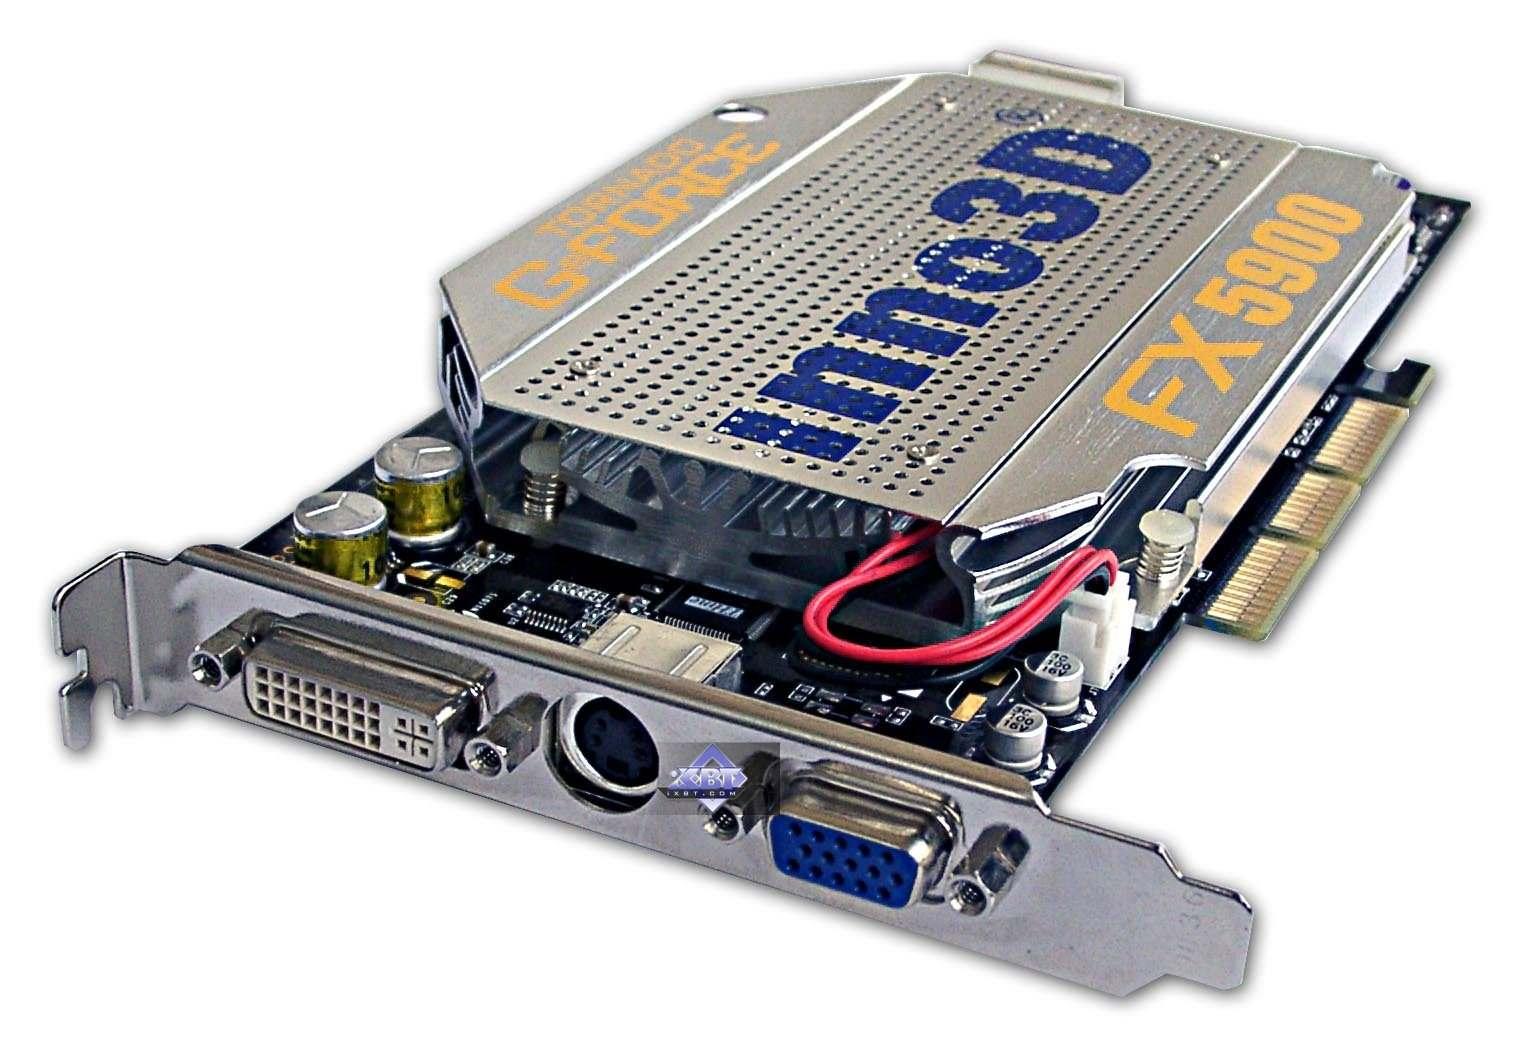 Inno3d Tornado Geforce Fx 128mb